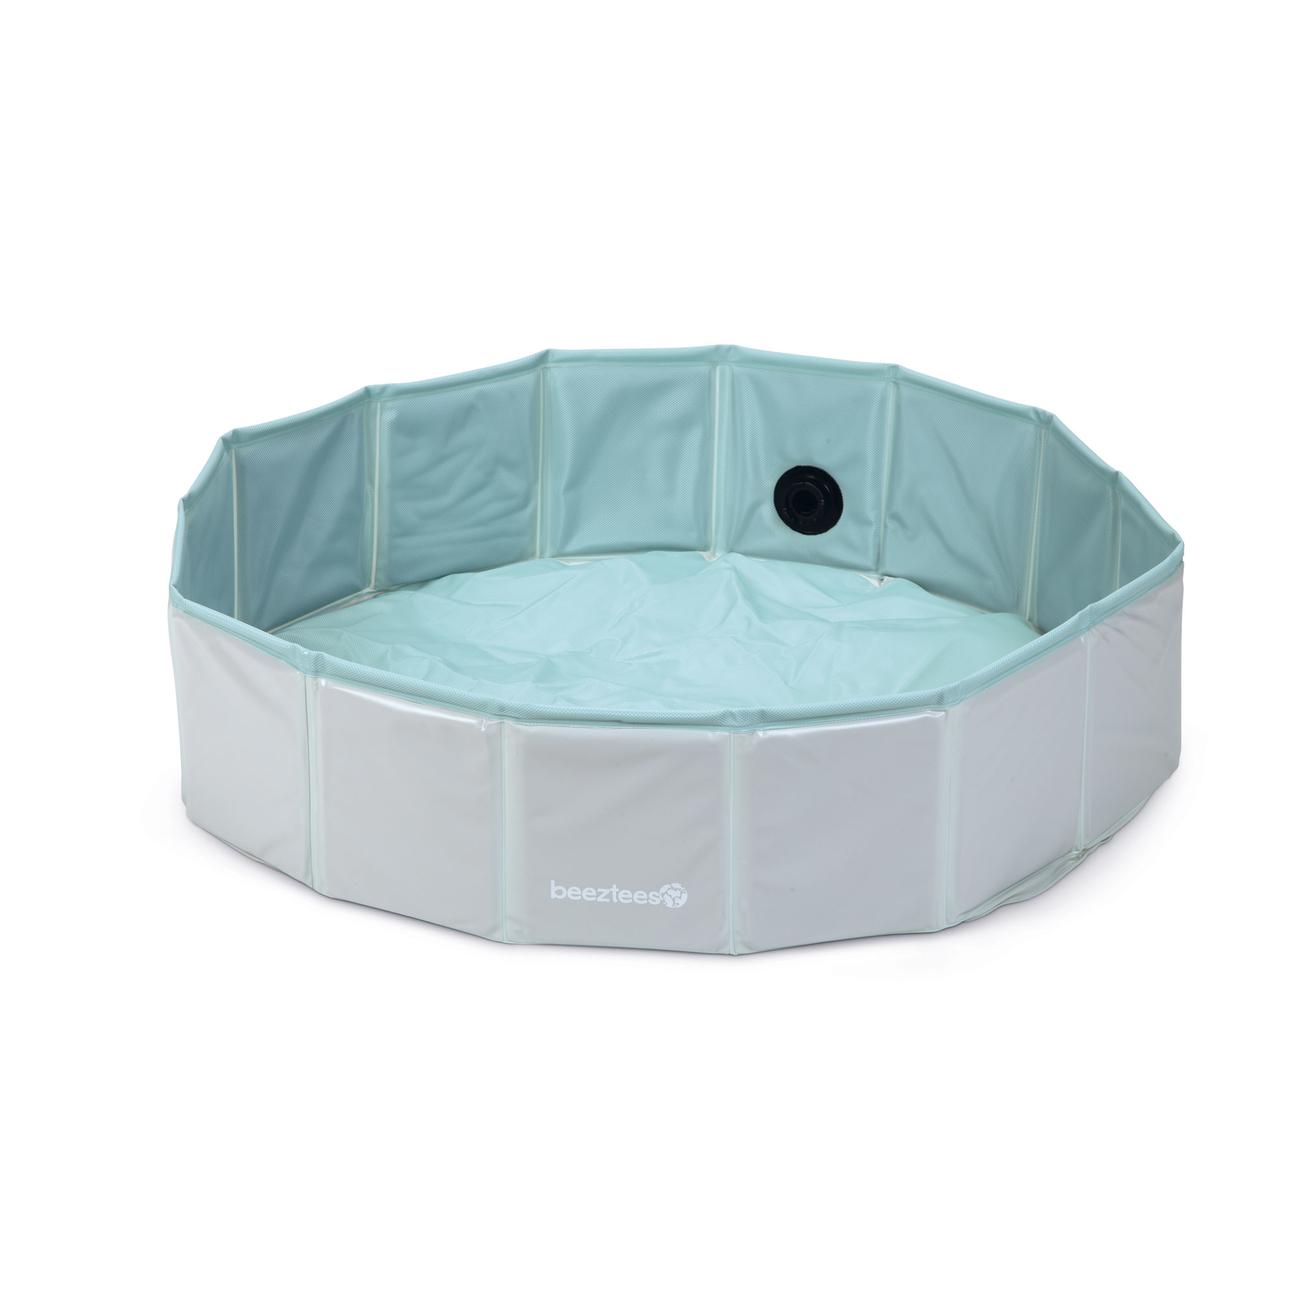 Beeztees Puppy Bällebad Hundepool Funchie, Pool, Bällebad 80 x 80 x 20 cm, mint, ohne Bälle